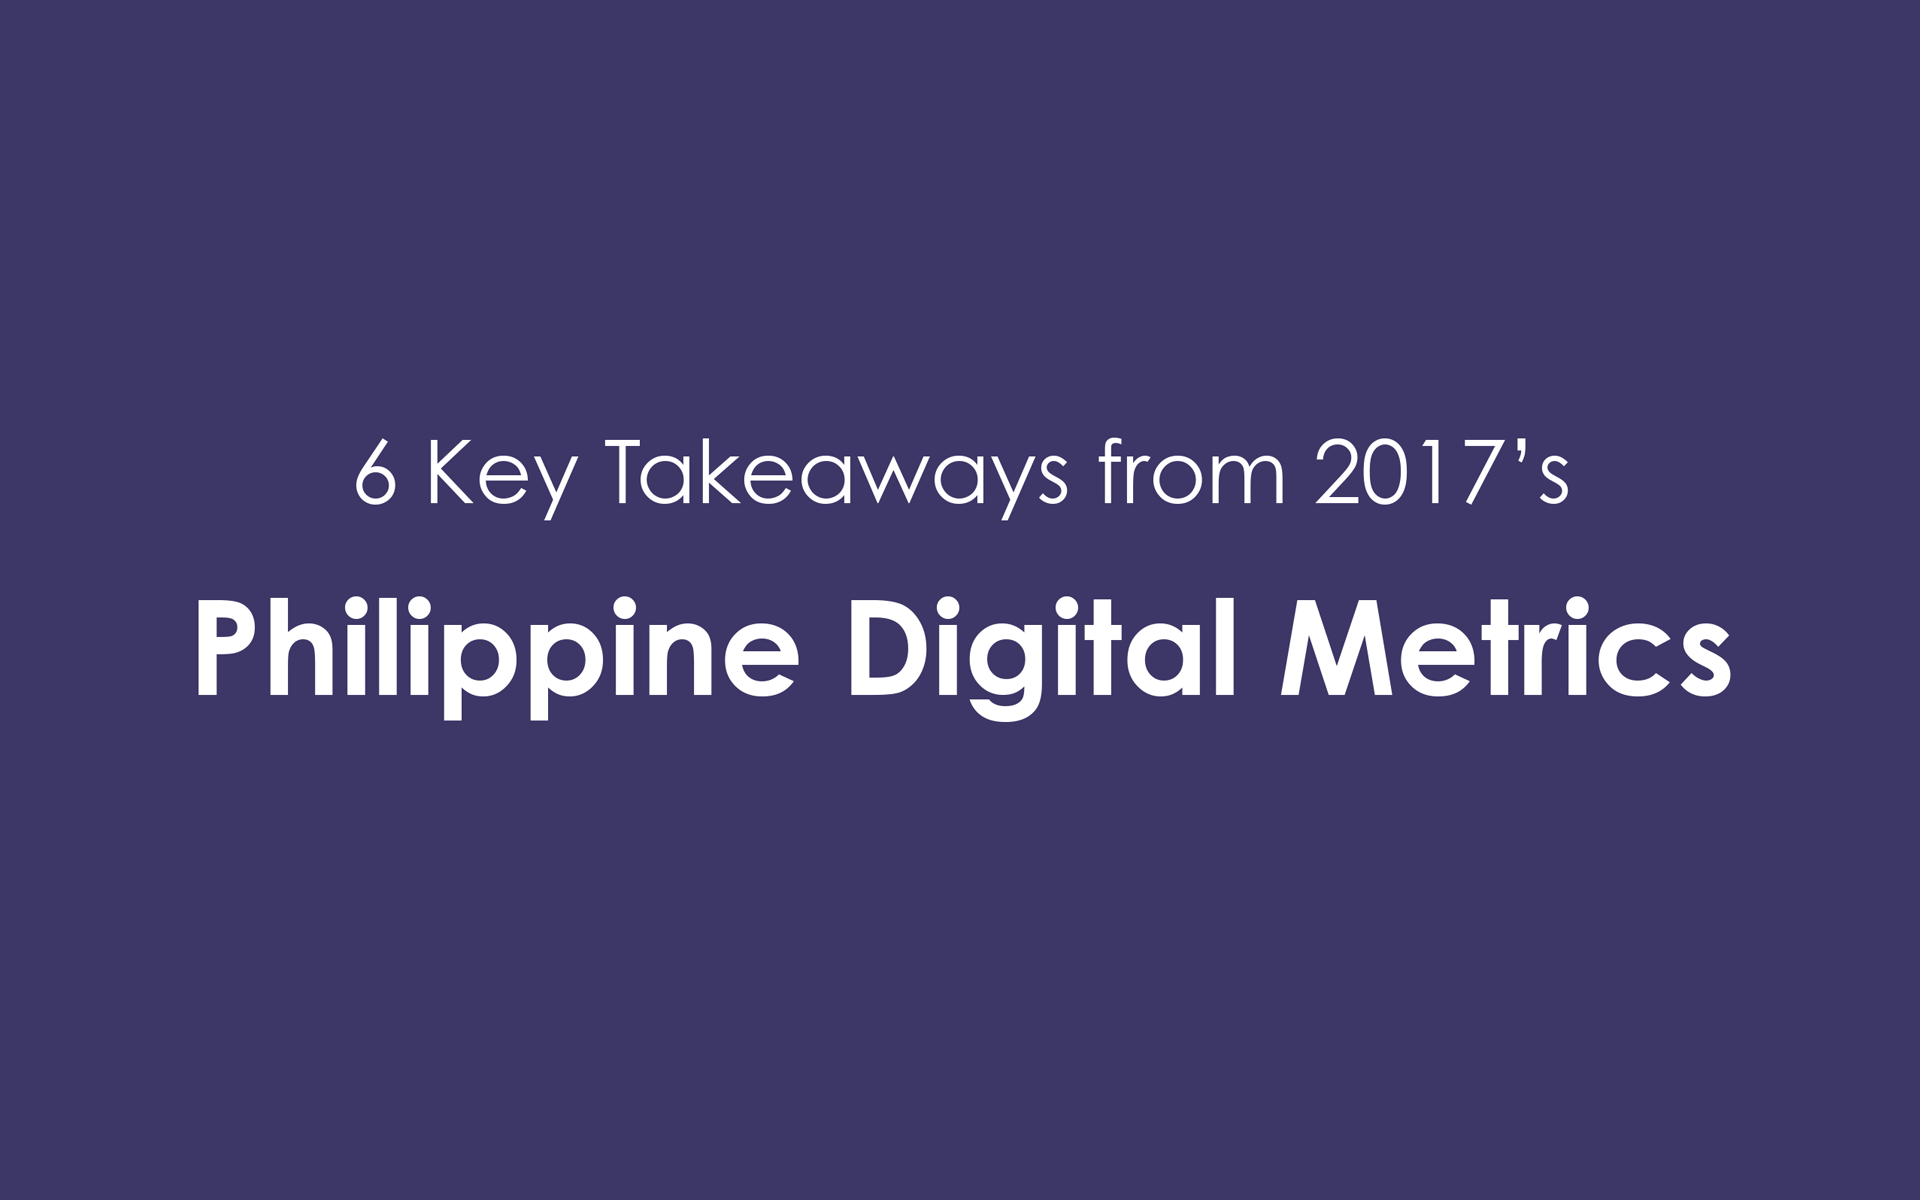 6 Key Takeaways from 2017's Philippine Digital Metrics